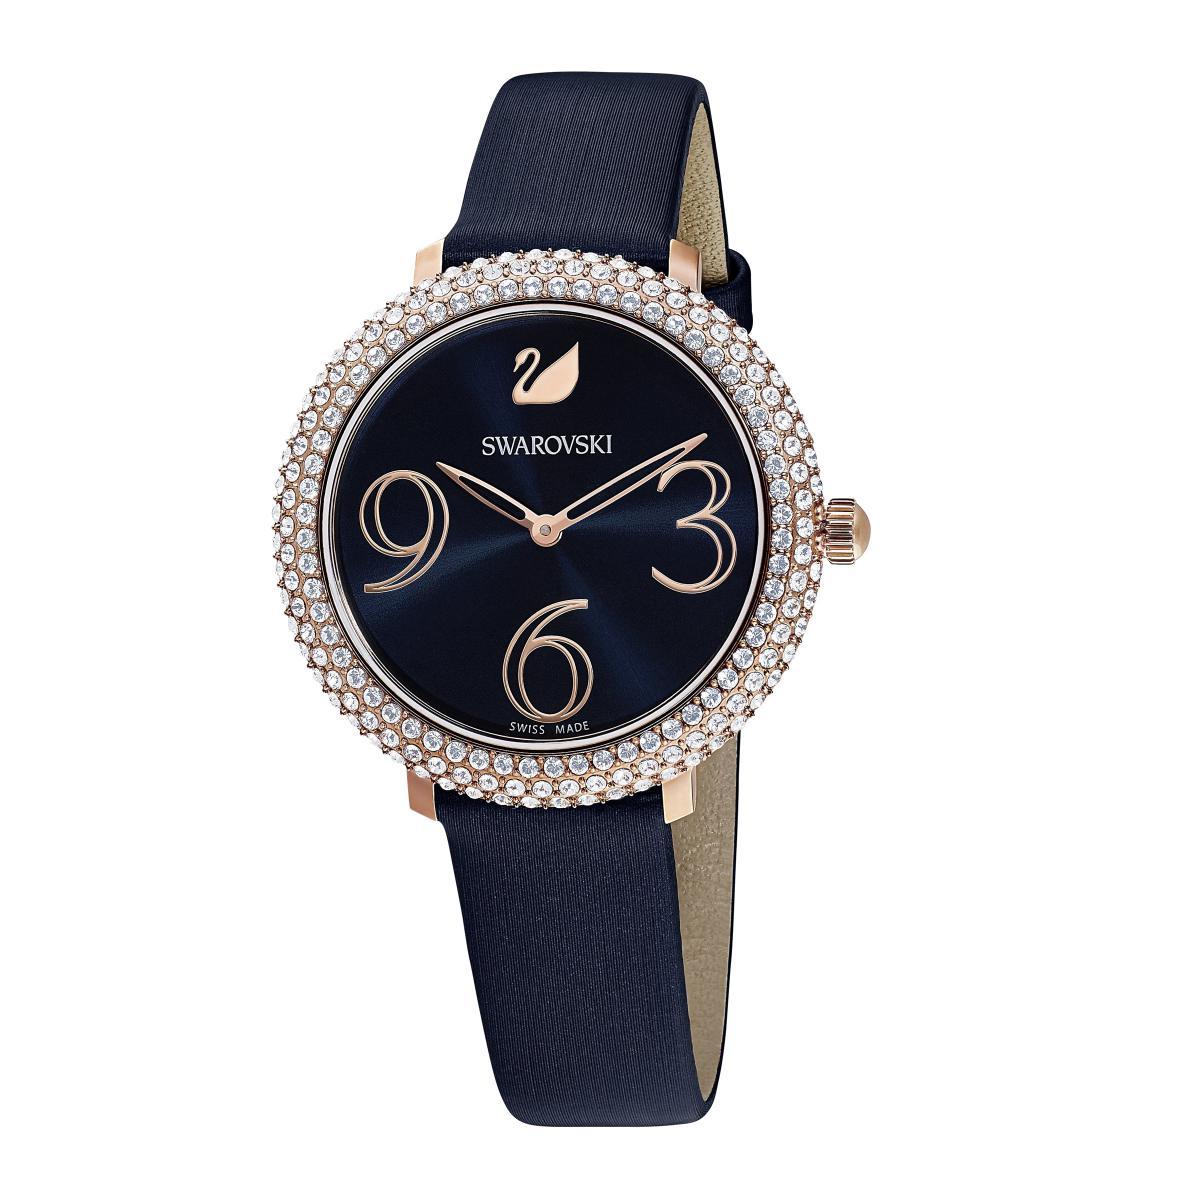 Promo : Montre Swarovski 5484061 - Bracelet Soie Bleu Lunette Micro-Pavé Cadran Rayon de soleil - Swarovski montres - Modalova